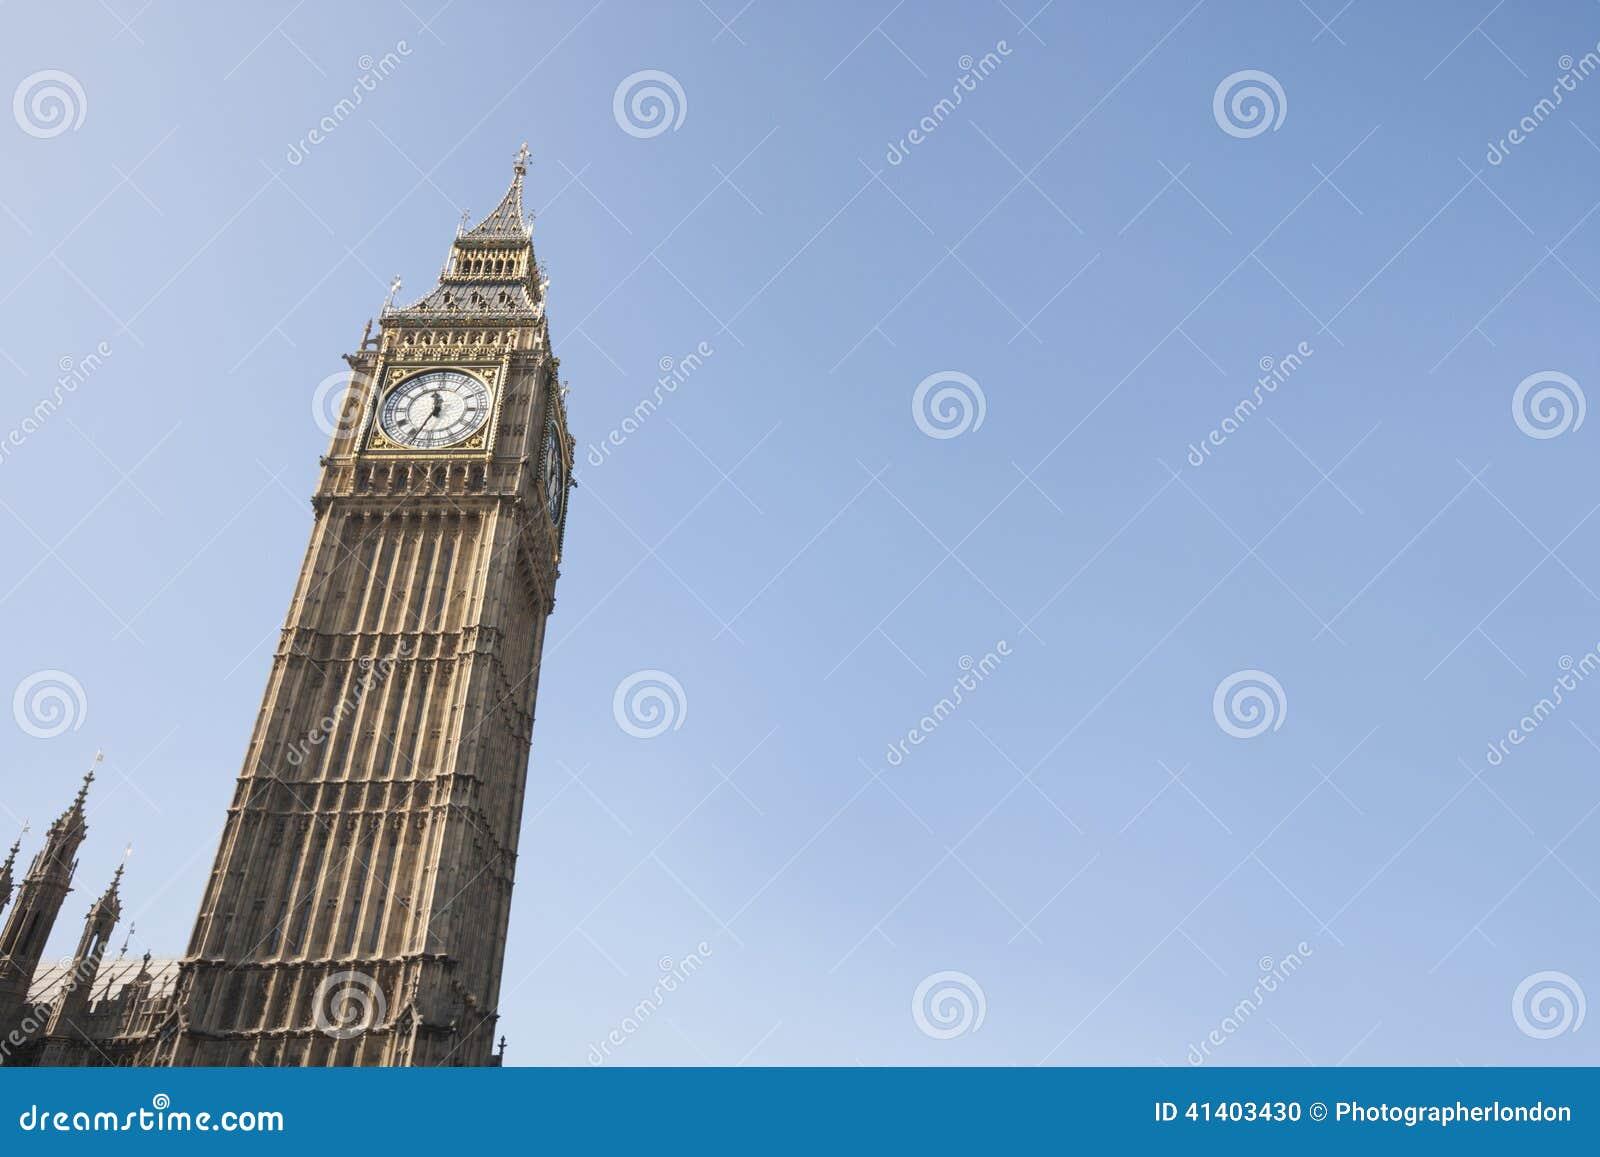 Vue d angle faible de Big Ben contre le ciel clair à Londres, Angleterre, R-U